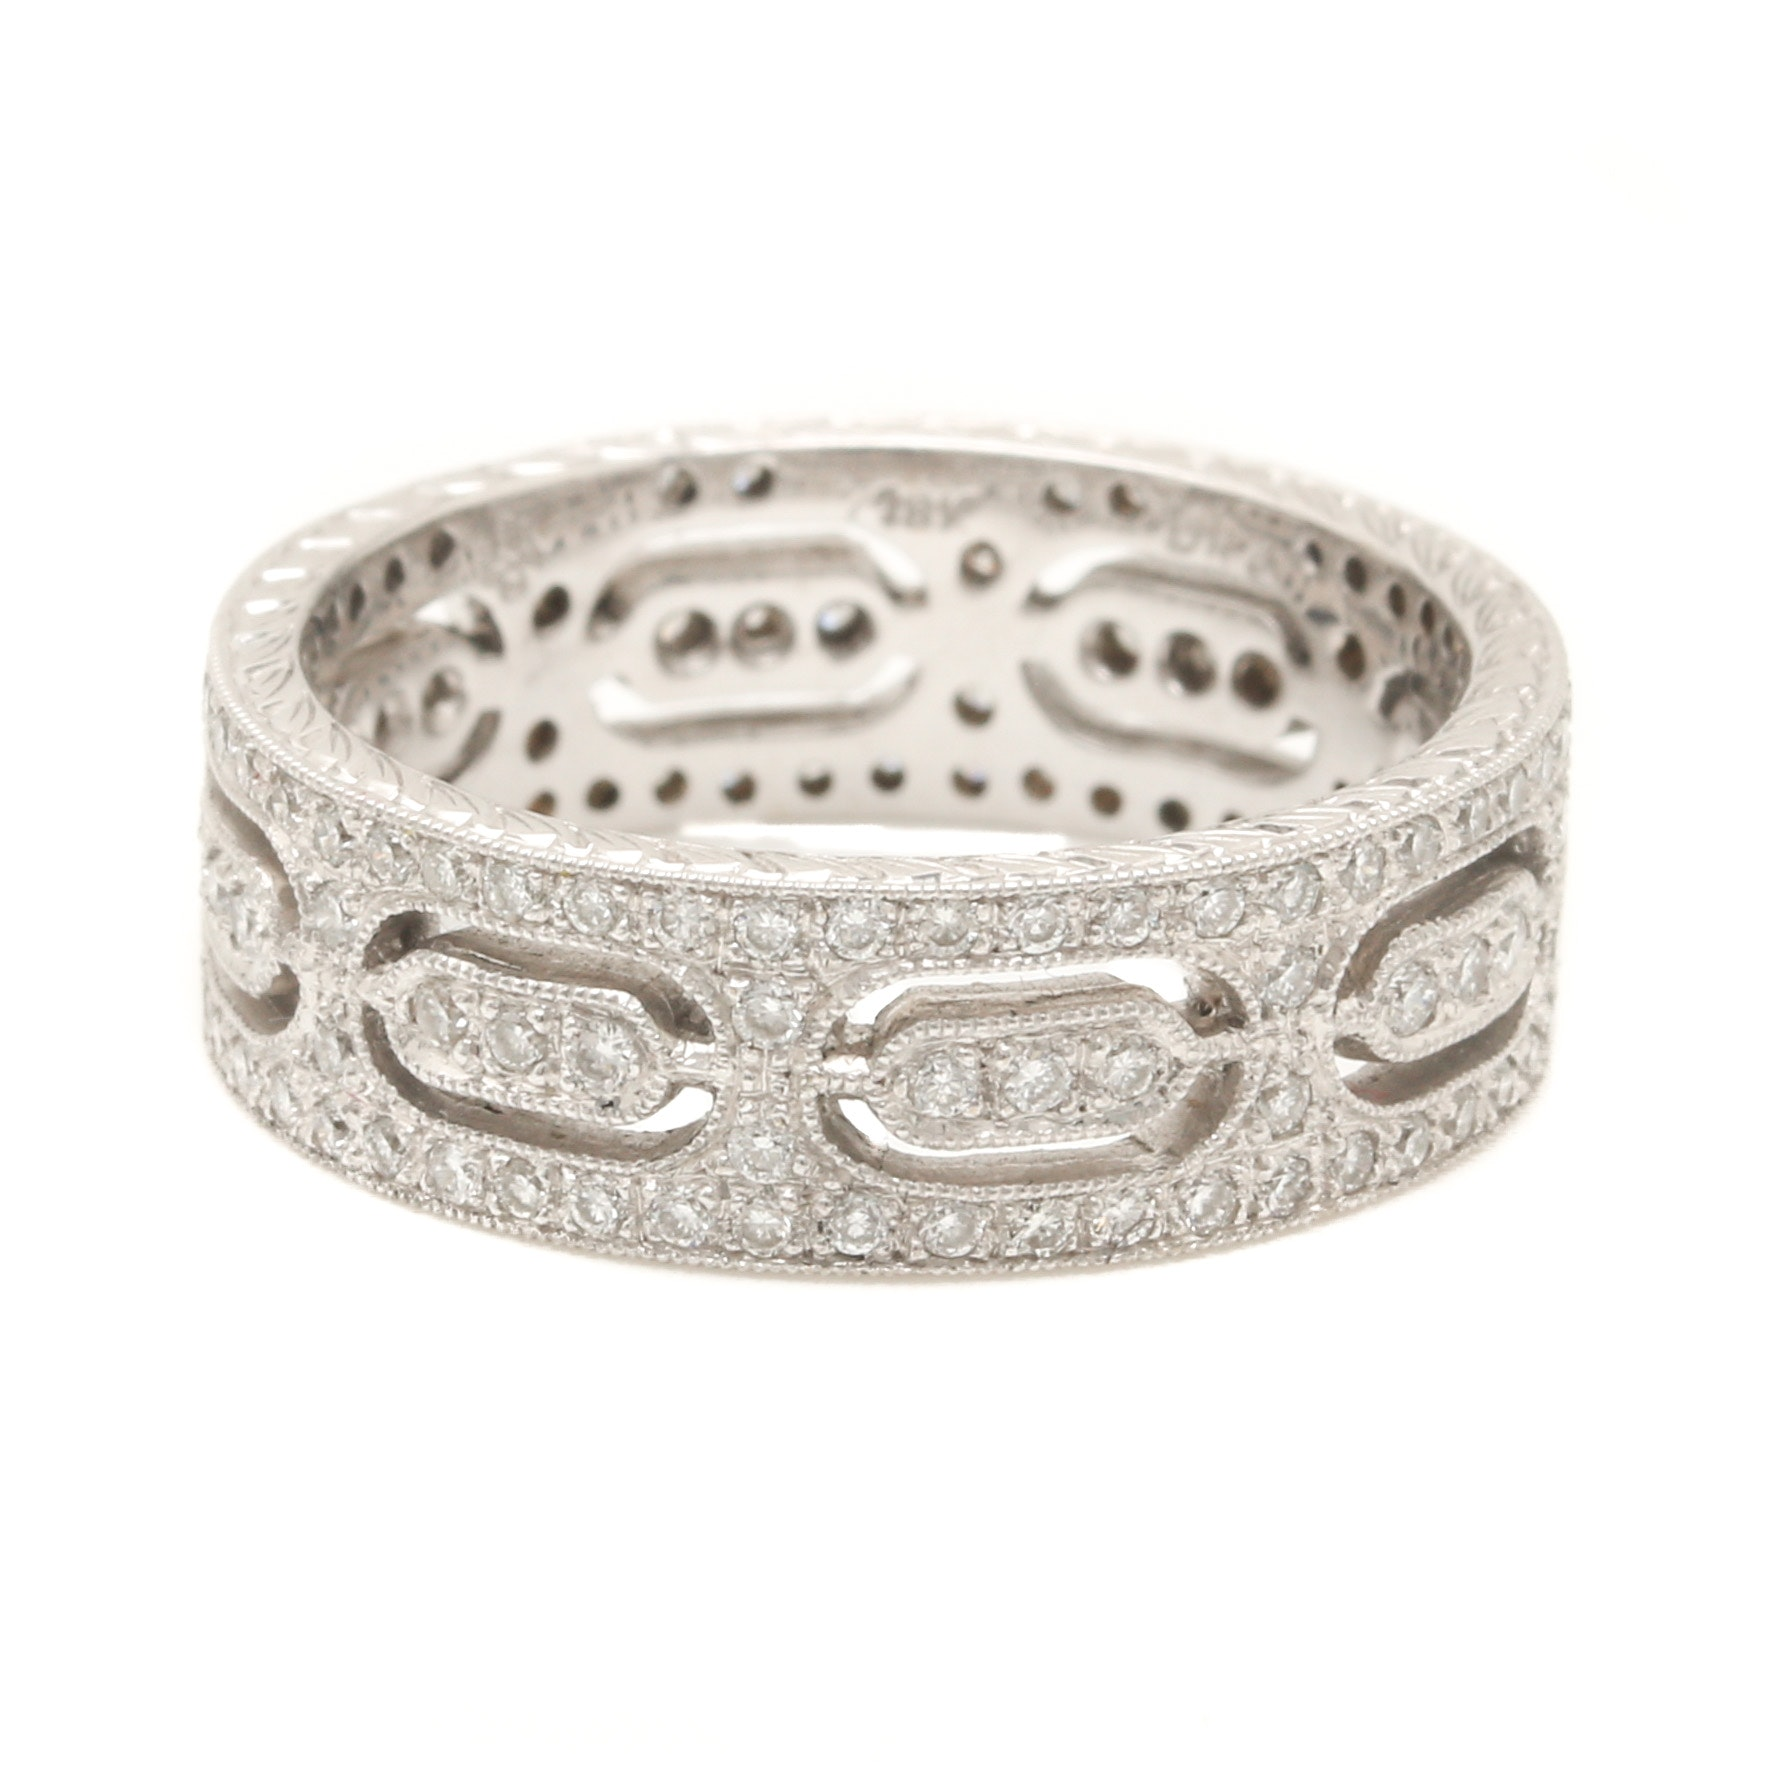 18K White Gold Openwork Diamond Eternity Ring Band